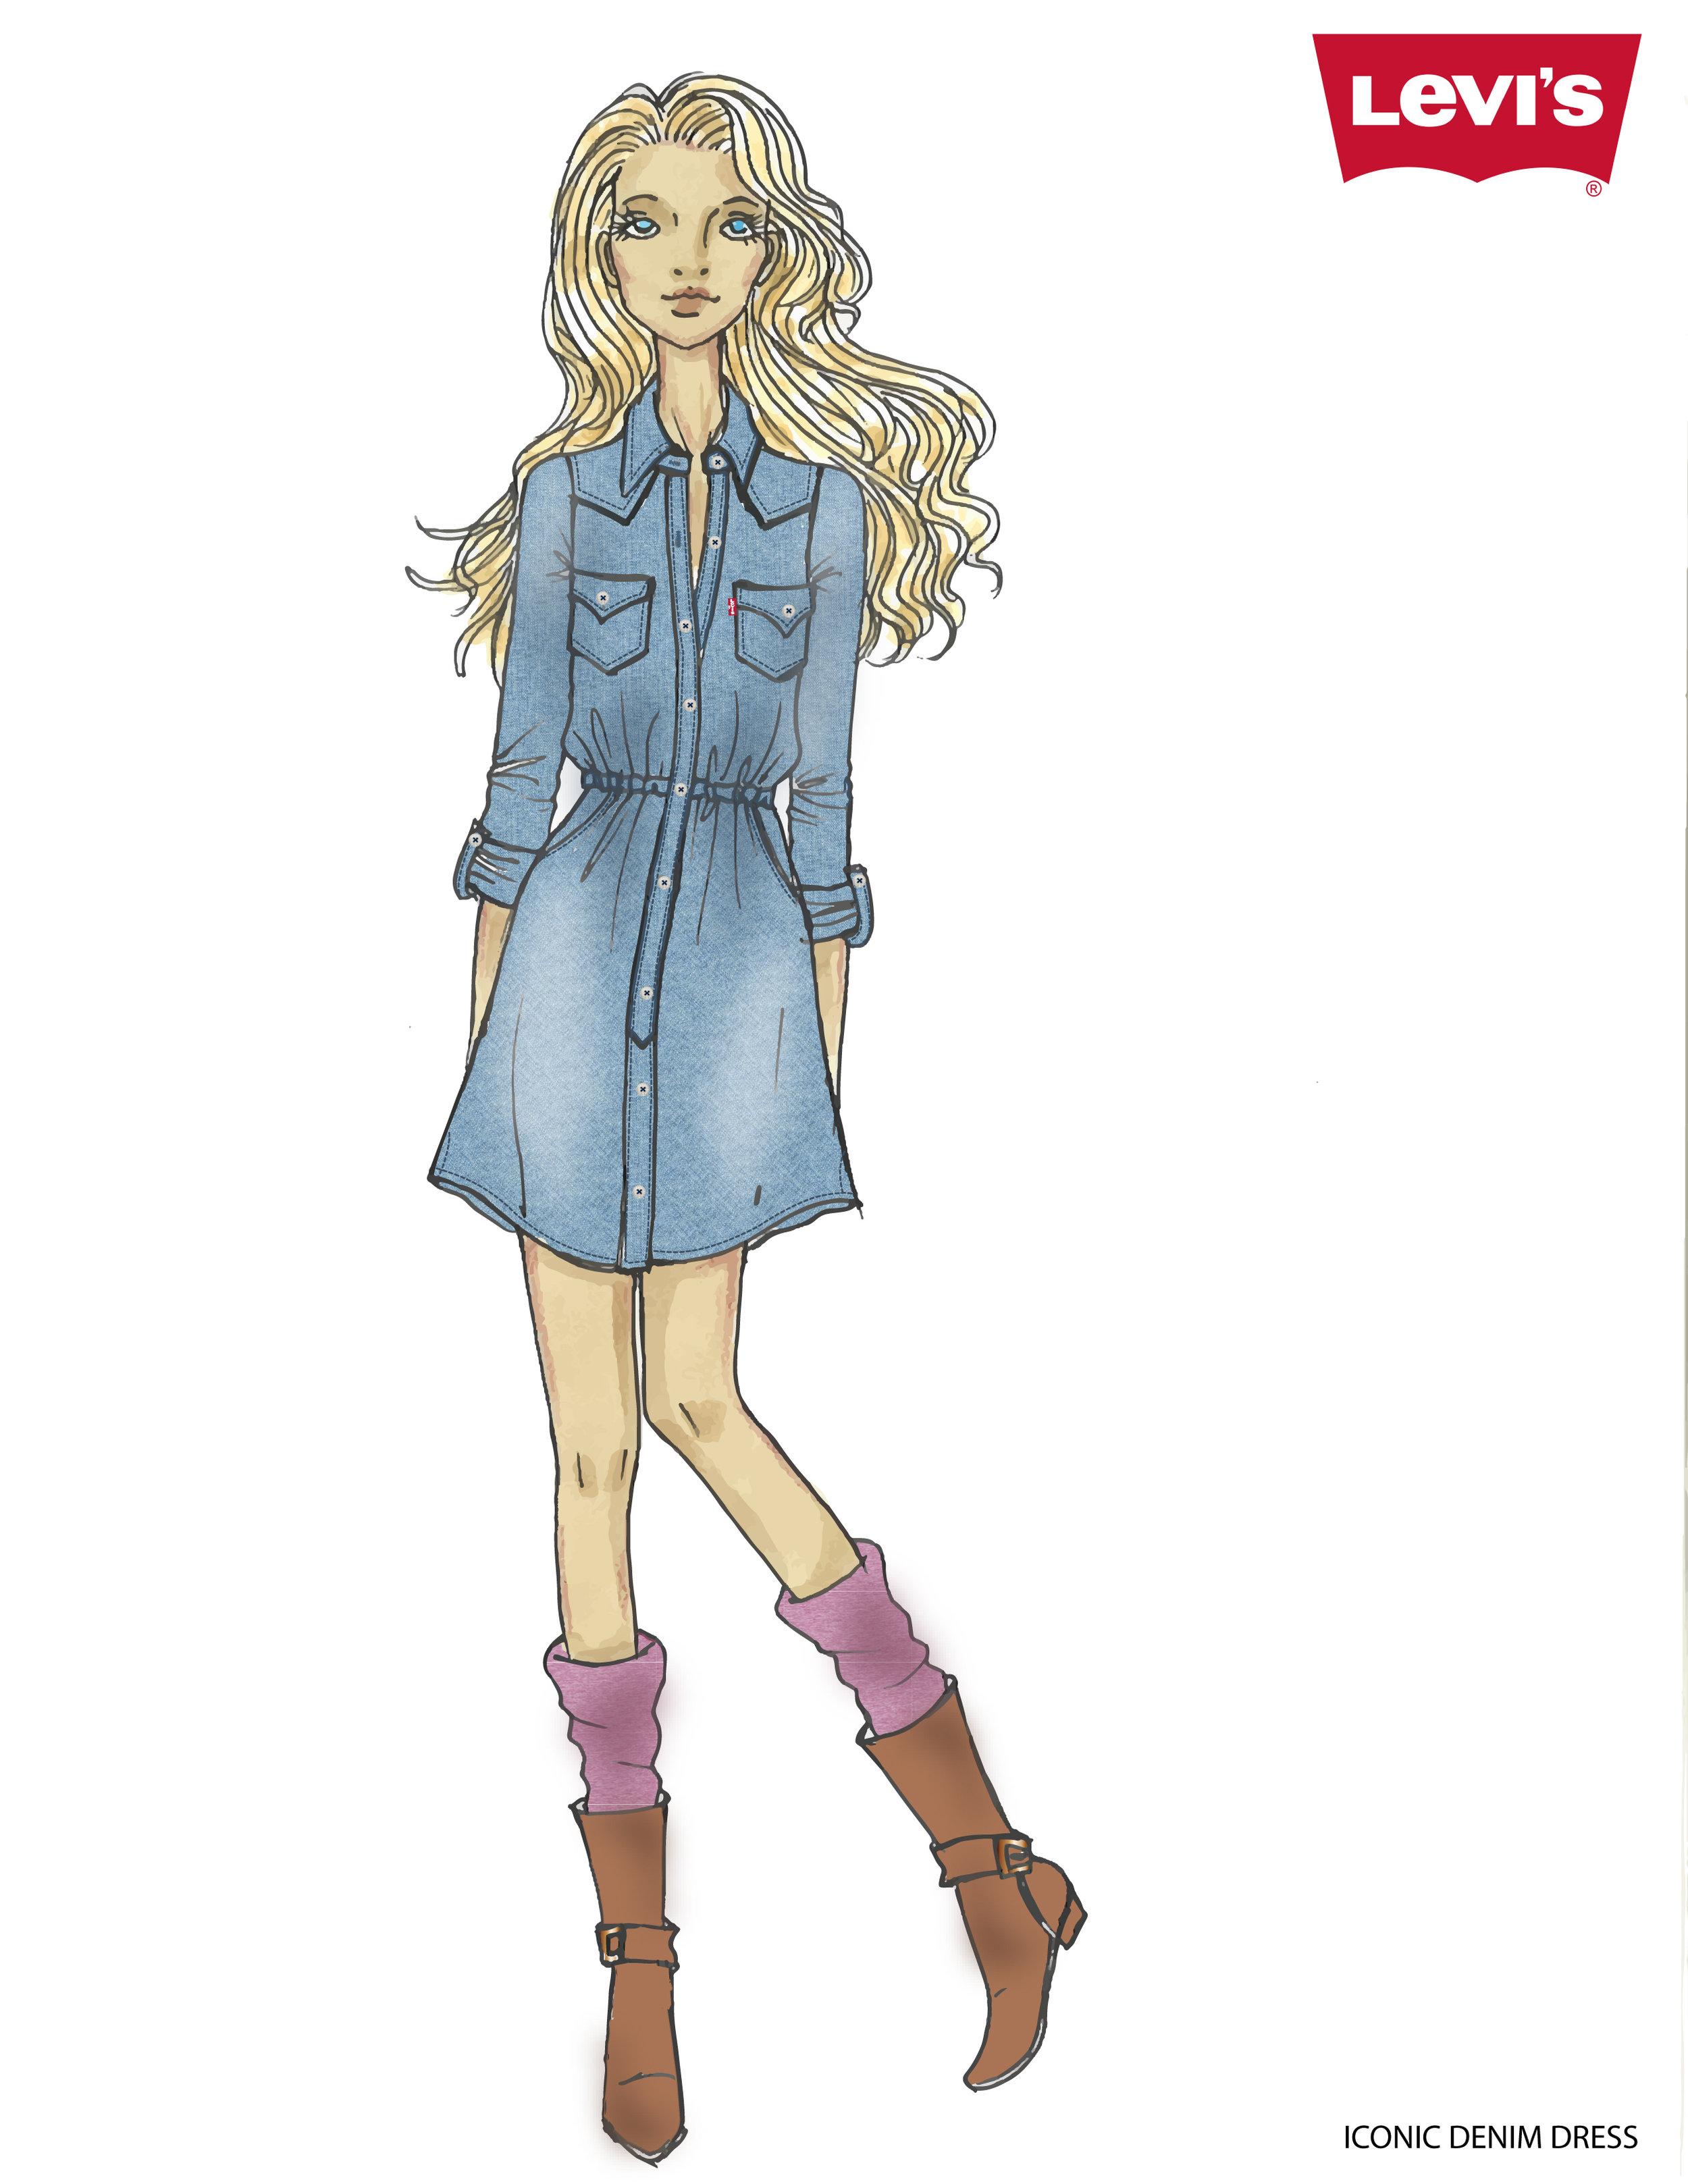 Western Dress Sketch - Fall 2017